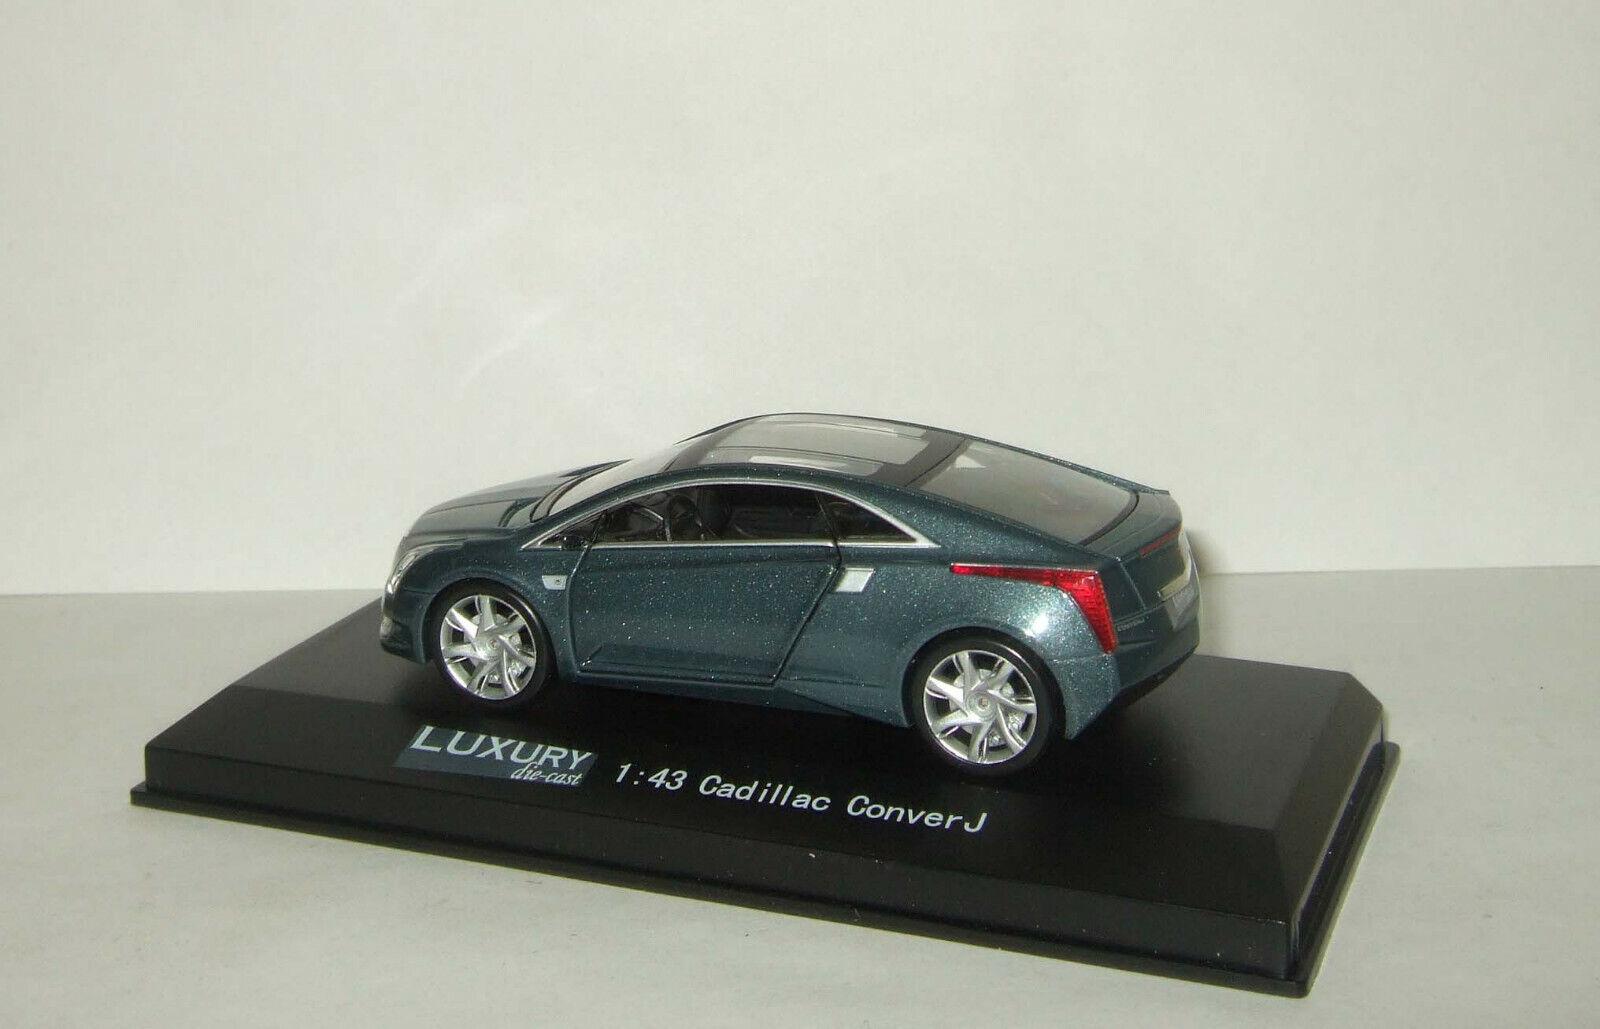 Cadillac Cadillac Cadillac Conver J 2011 Luxury Diecast 1 43 64a5fe